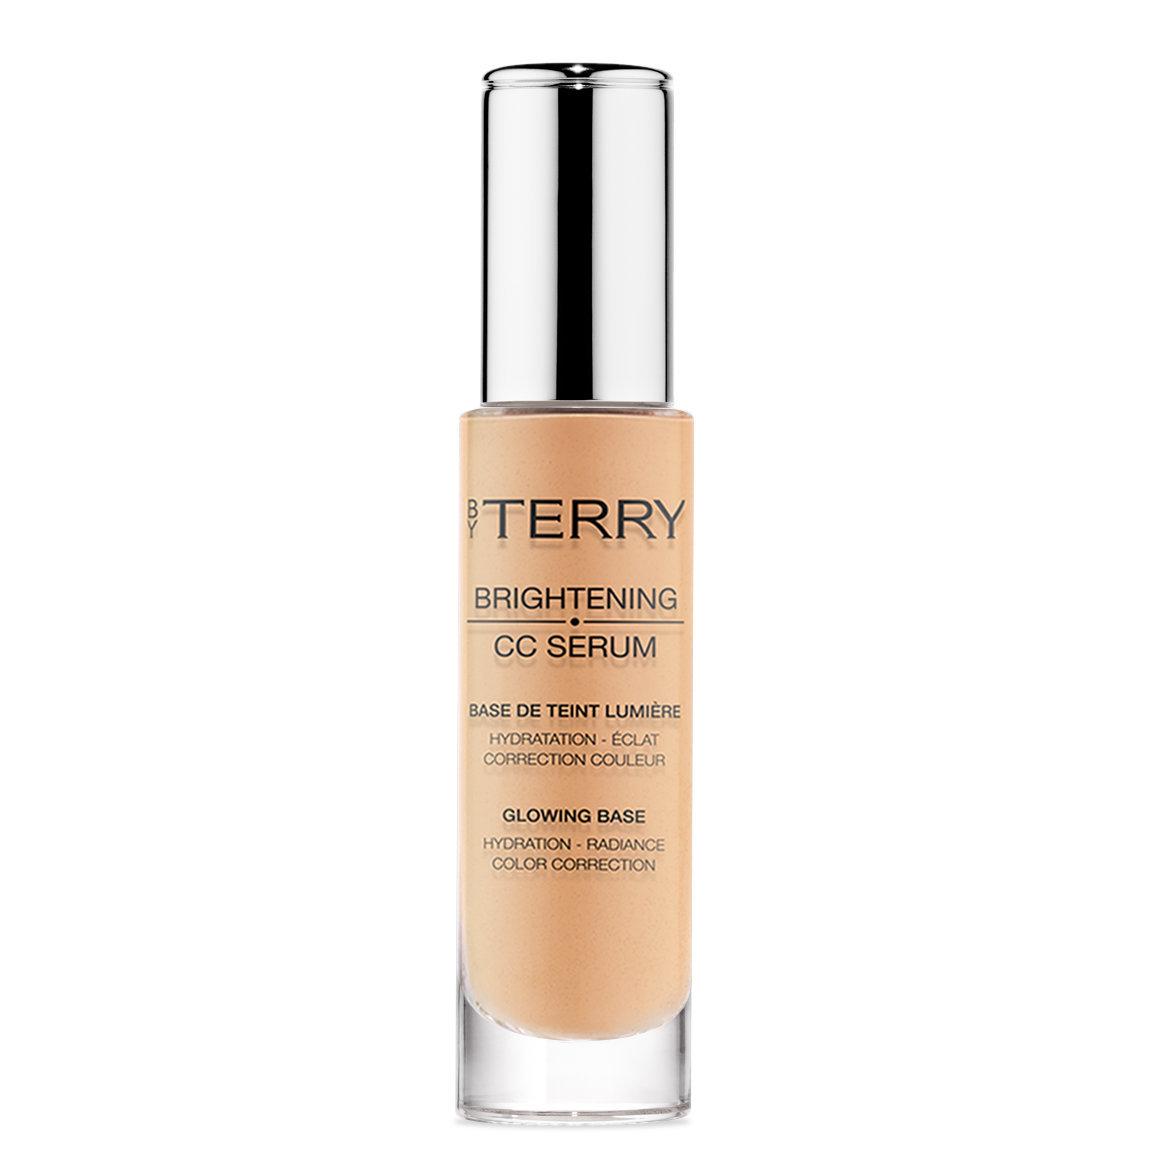 BY TERRY Brightening CC Serum 3 Apricot Glow